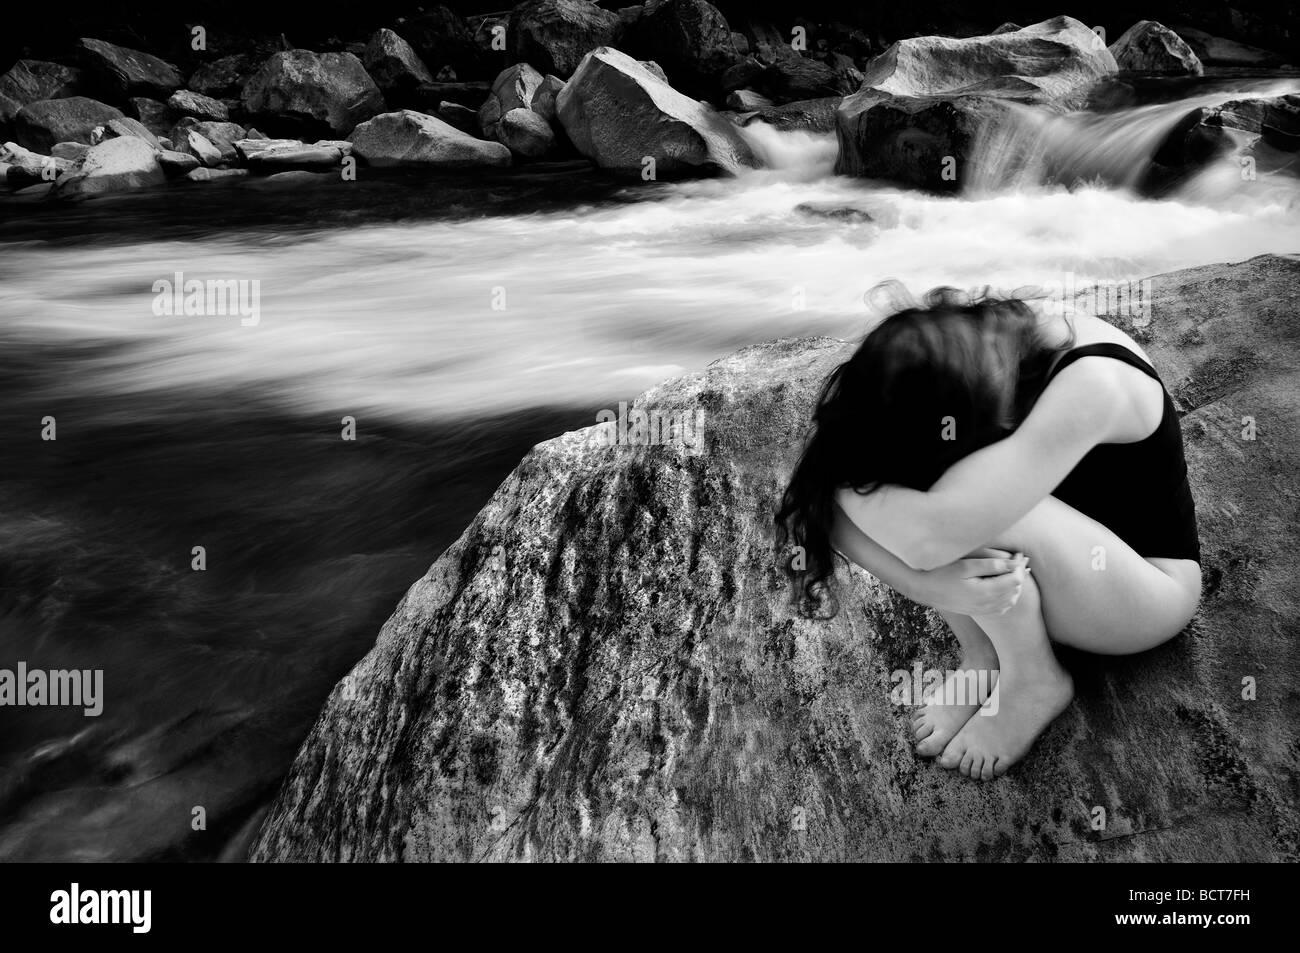 Mädchen in der Nähe eines Flusses Stockbild